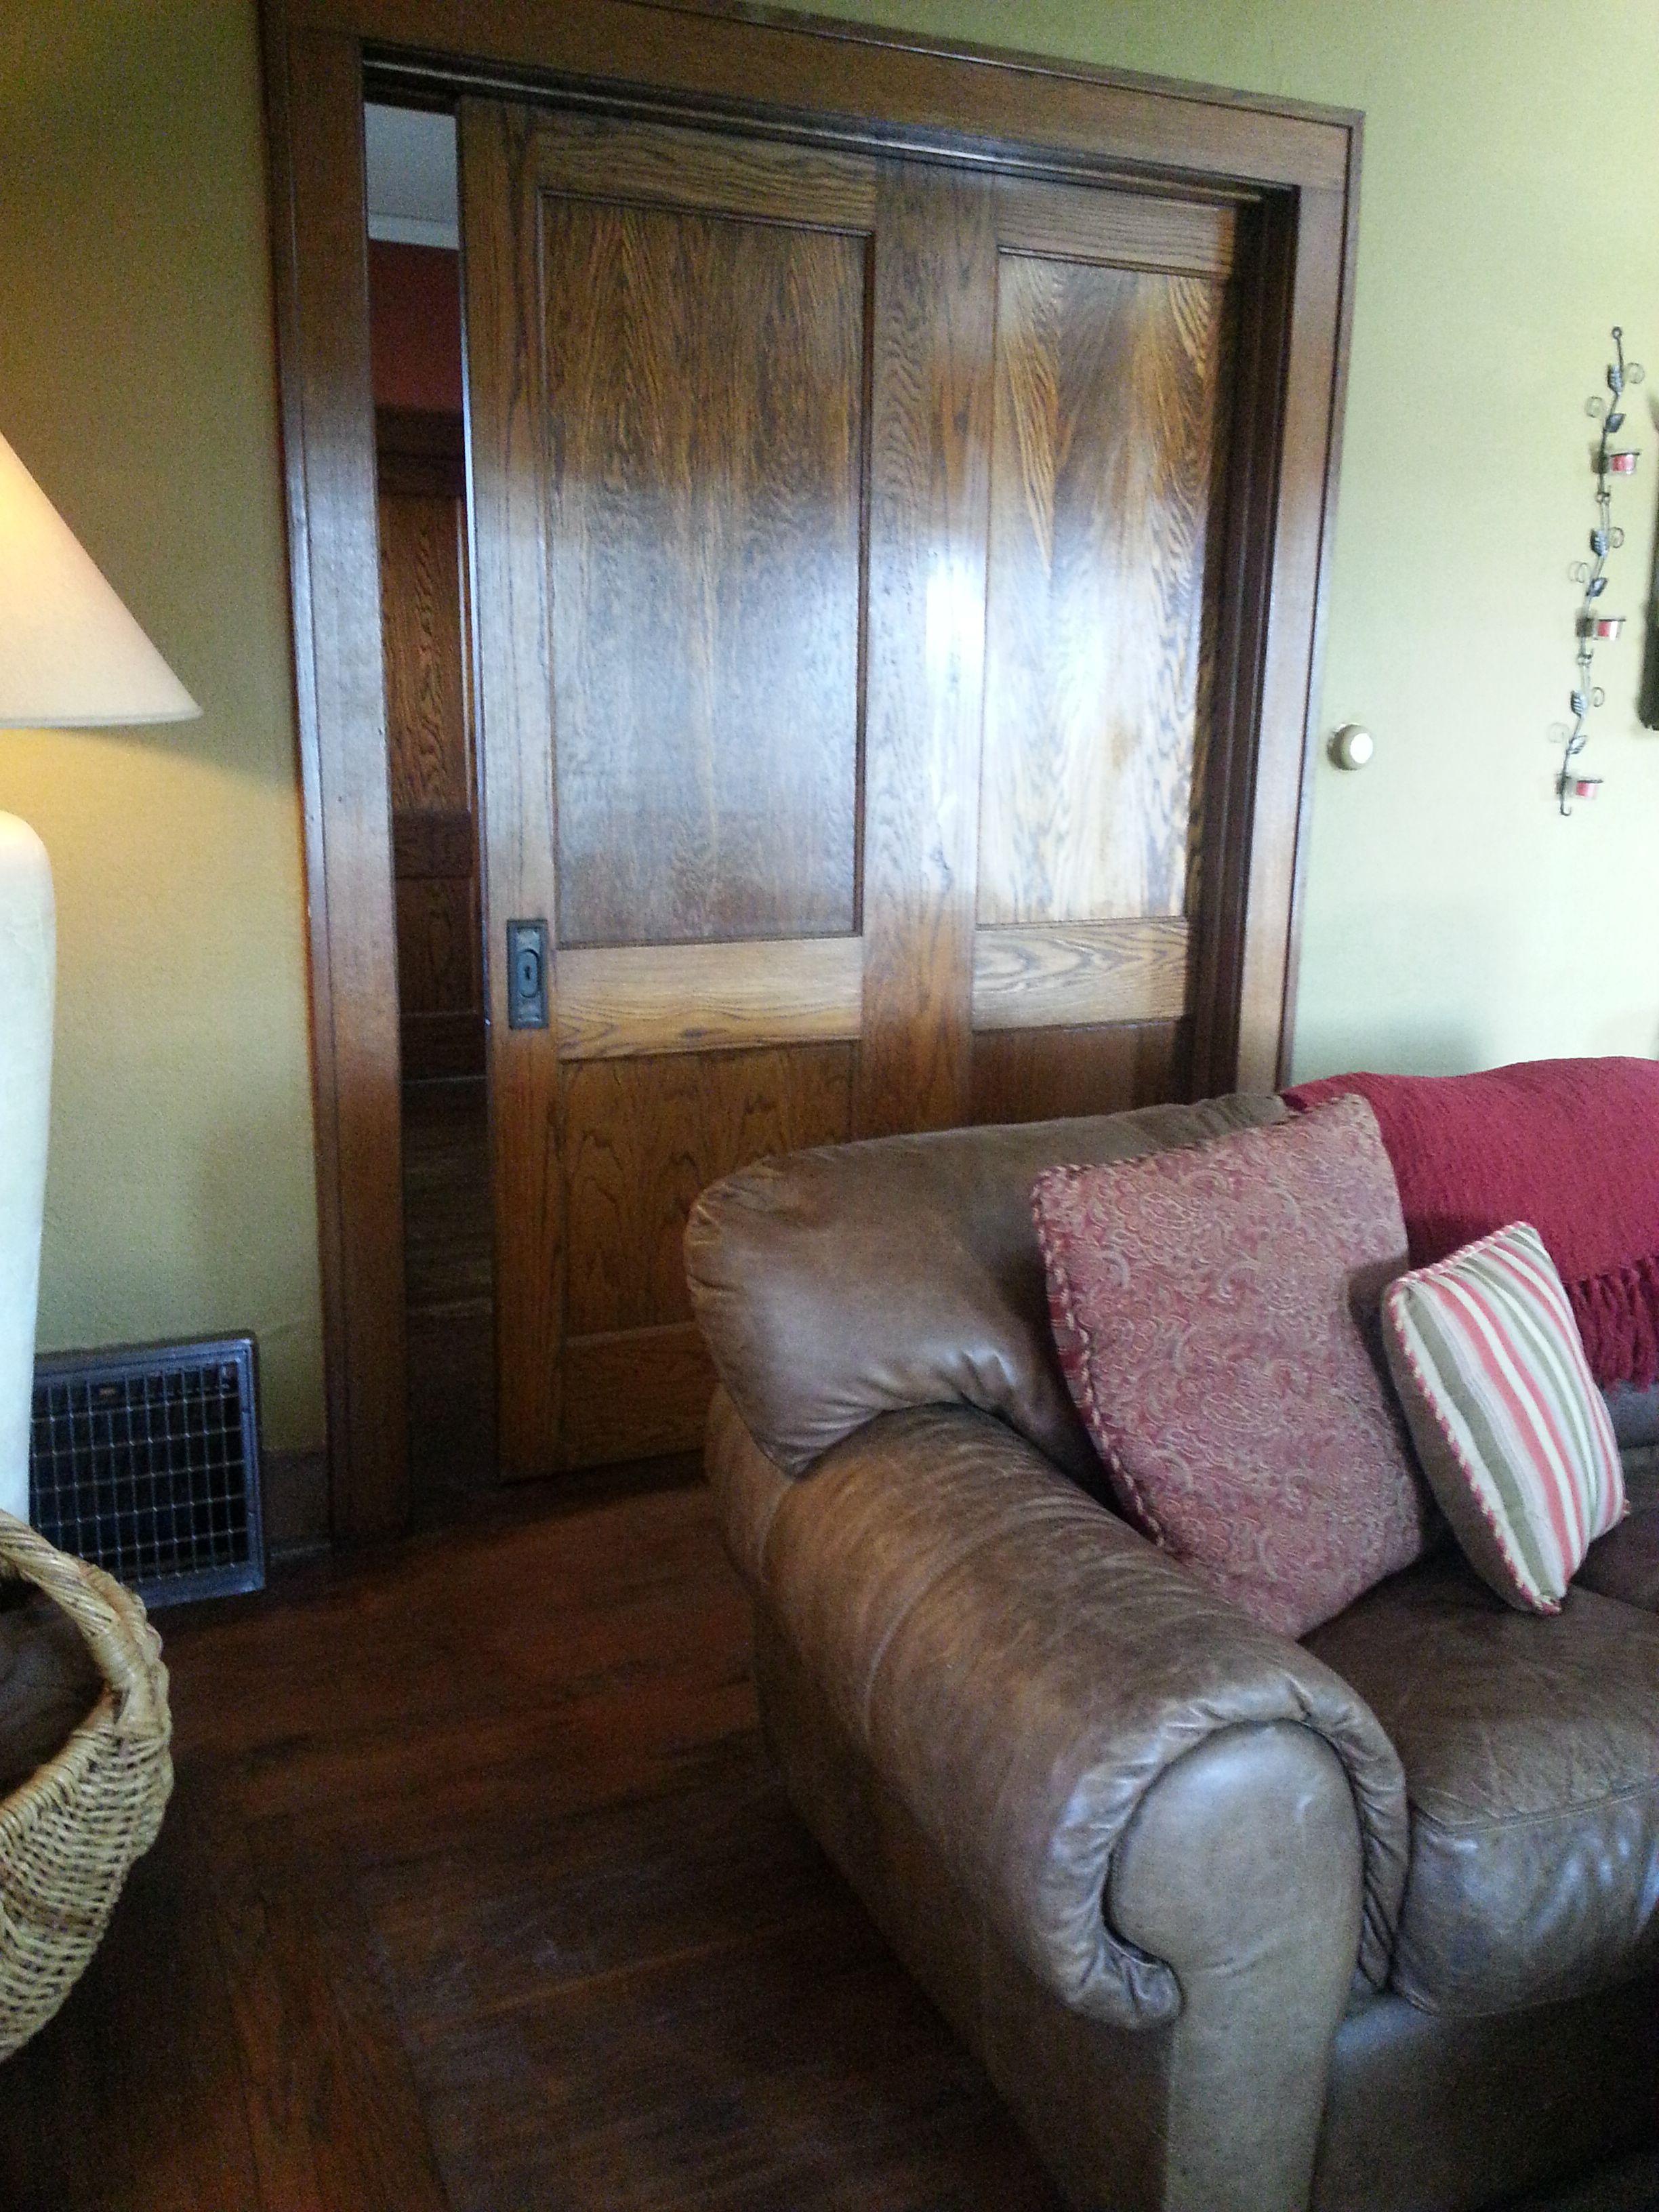 Tiger Oak Double Pocket Door Original To This Sears Craftsman Home 1916 1925 Era Www Realtyfive Com Home Craftsman House Pocket Doors